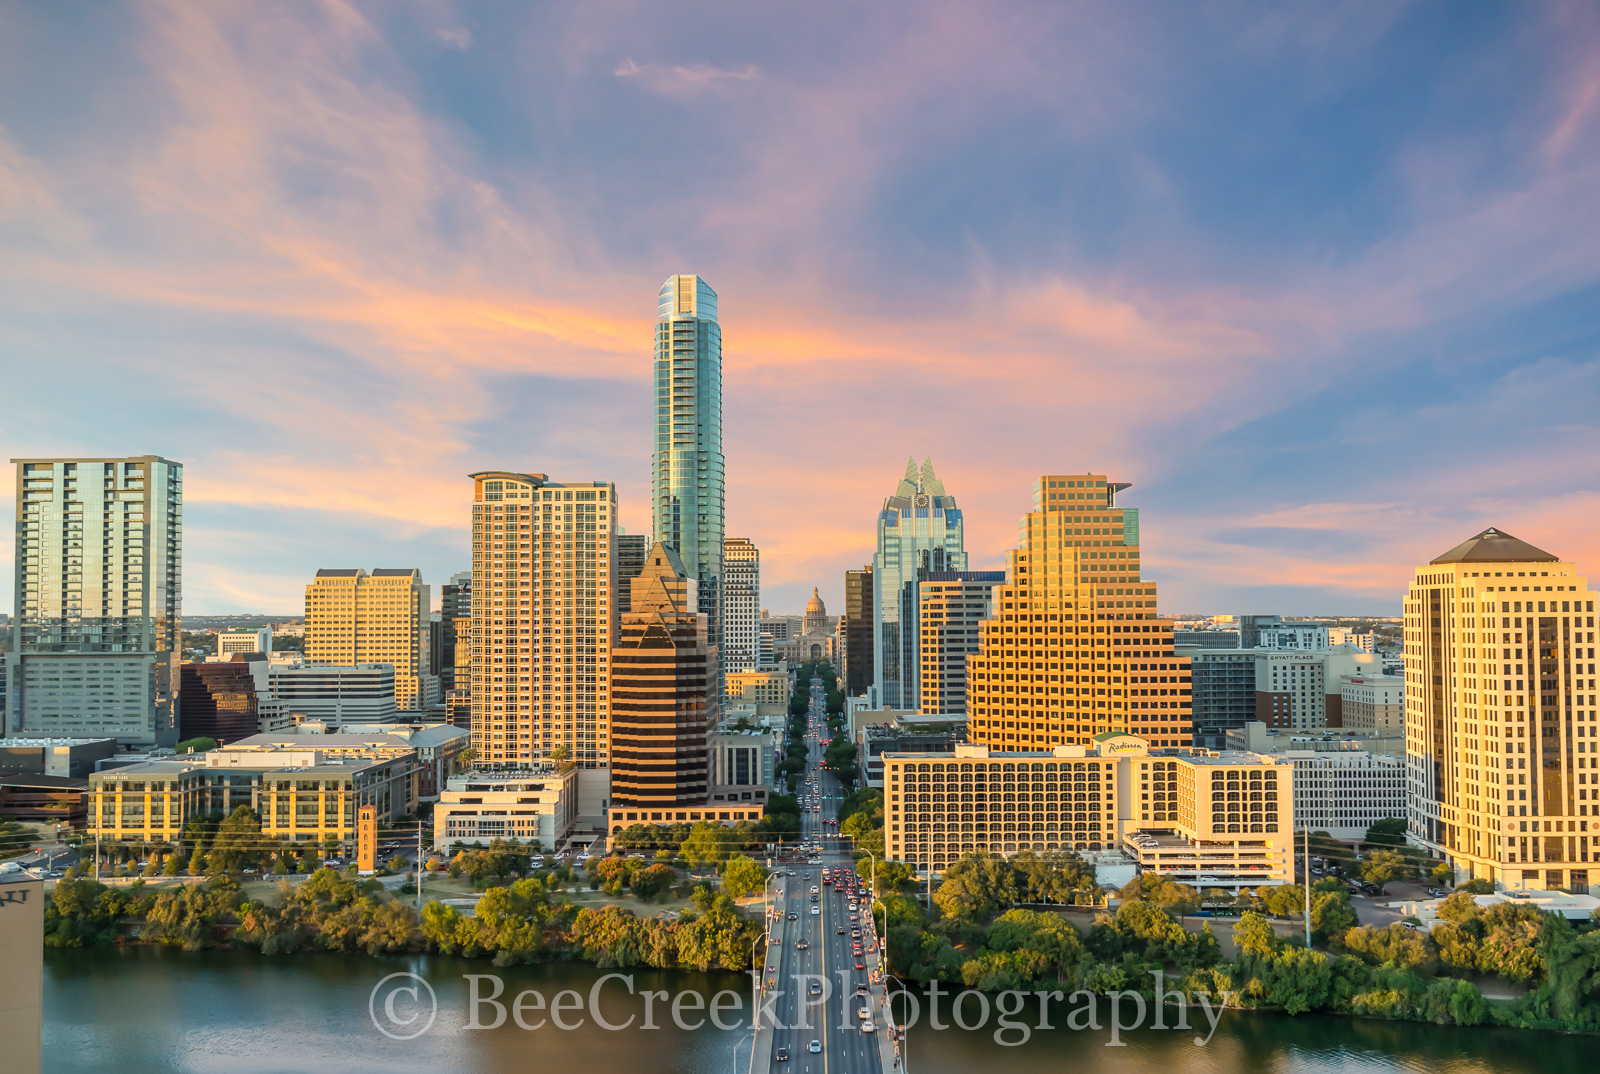 Austin, Congress, Texas, over austin, congress bridge, Lady bird lake, sunset, dusk, high rise, glow, downtown, urban, skyline, cityscape, capital, capitol, aerial, drone, phototgraphy, bee creek phot, photo